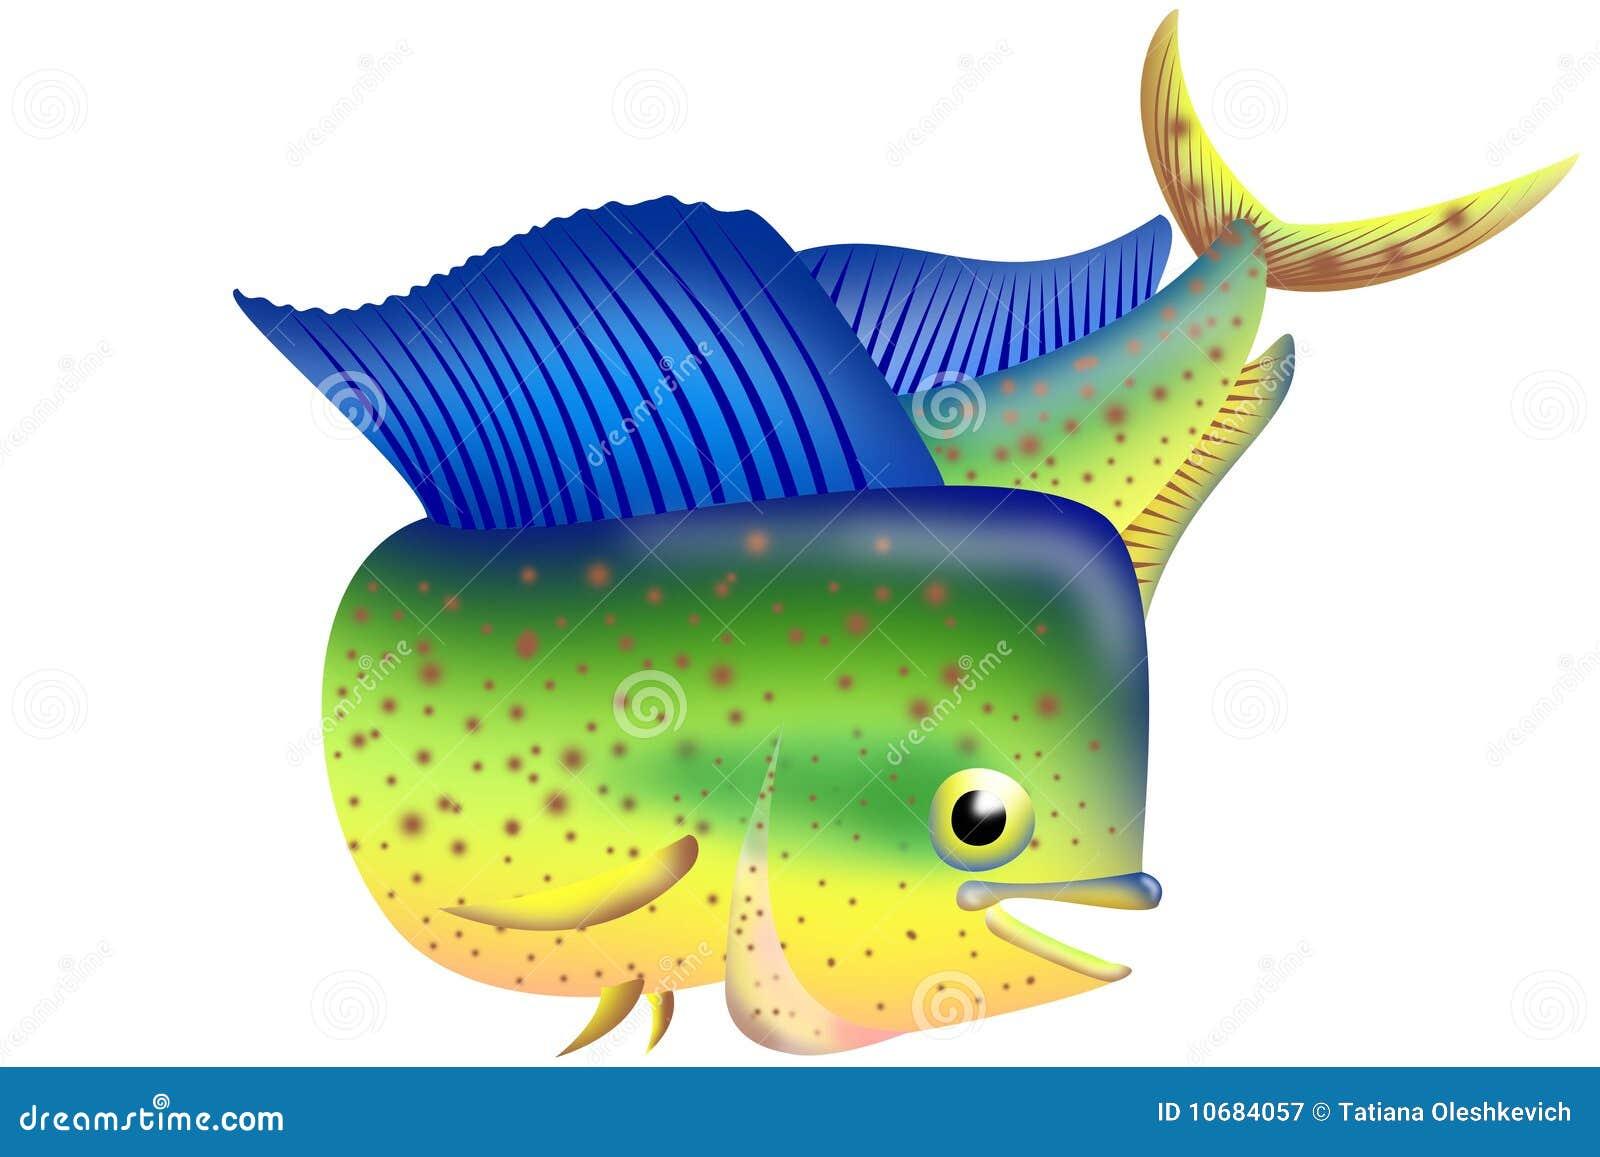 Illustration Of Dorado Fish Royalty Free Stock Photography - Image: 10684057